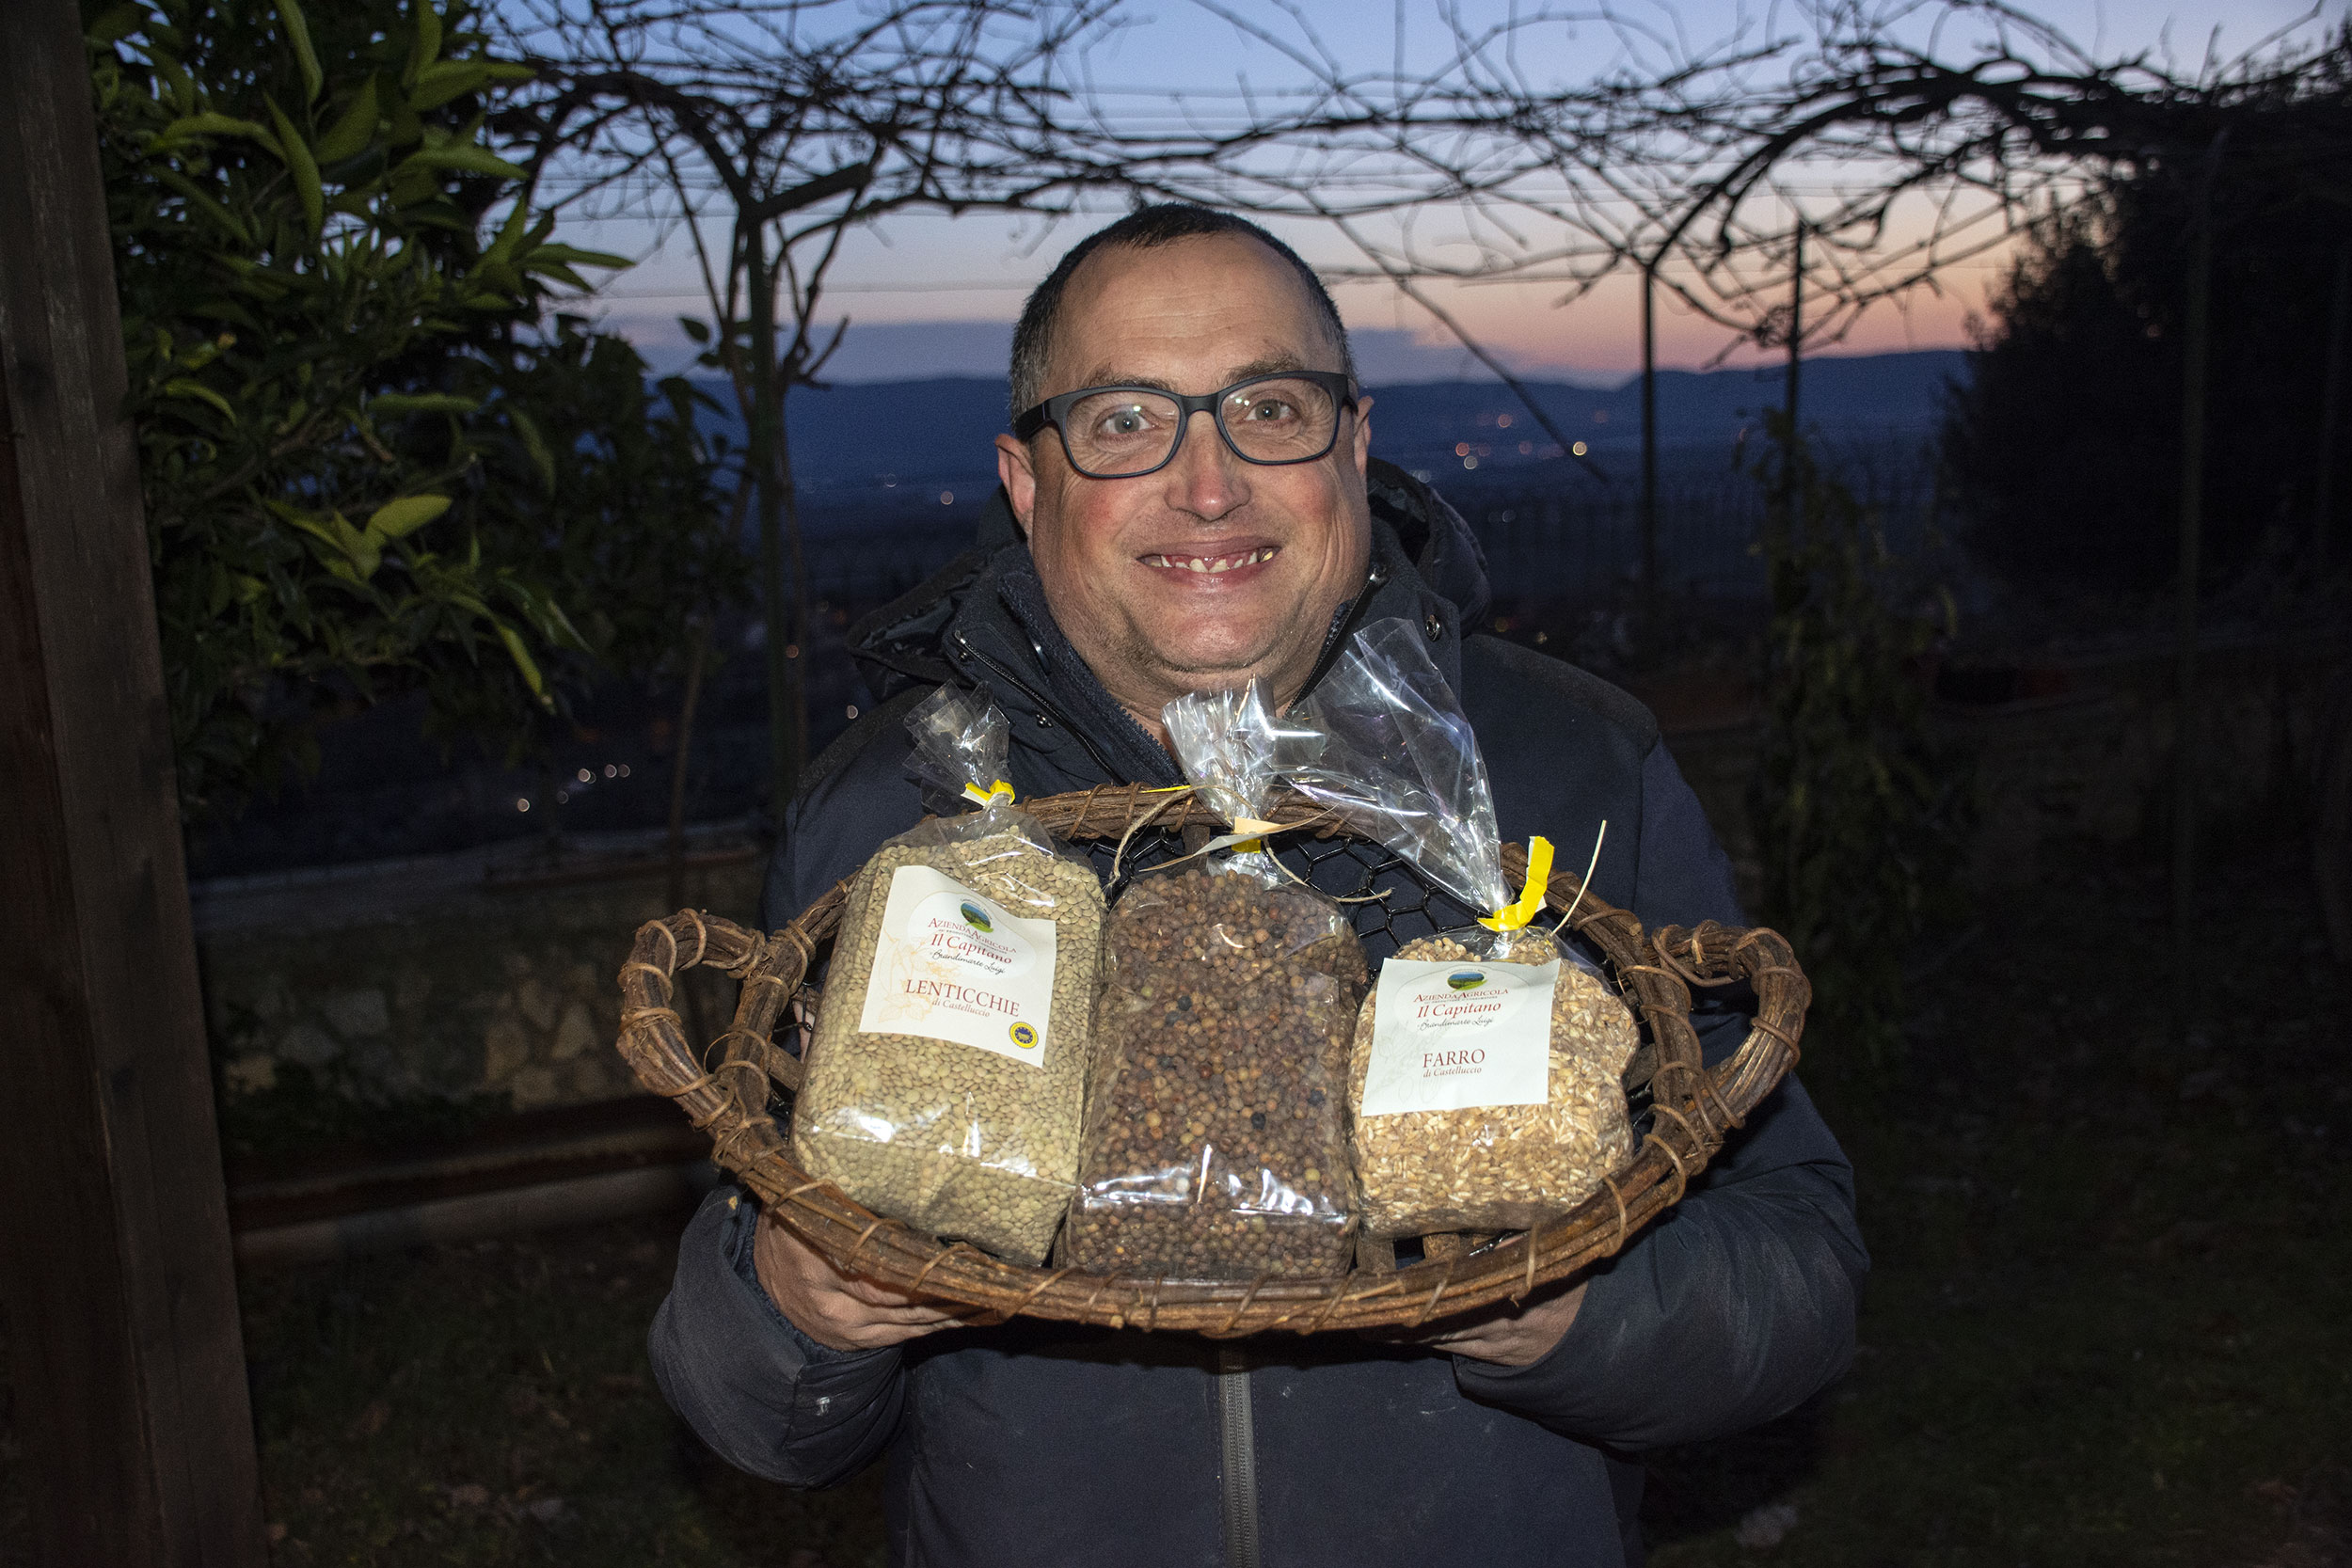 agricola il capitano luigi brandimarte lenticchia igp castelluccio di norcia